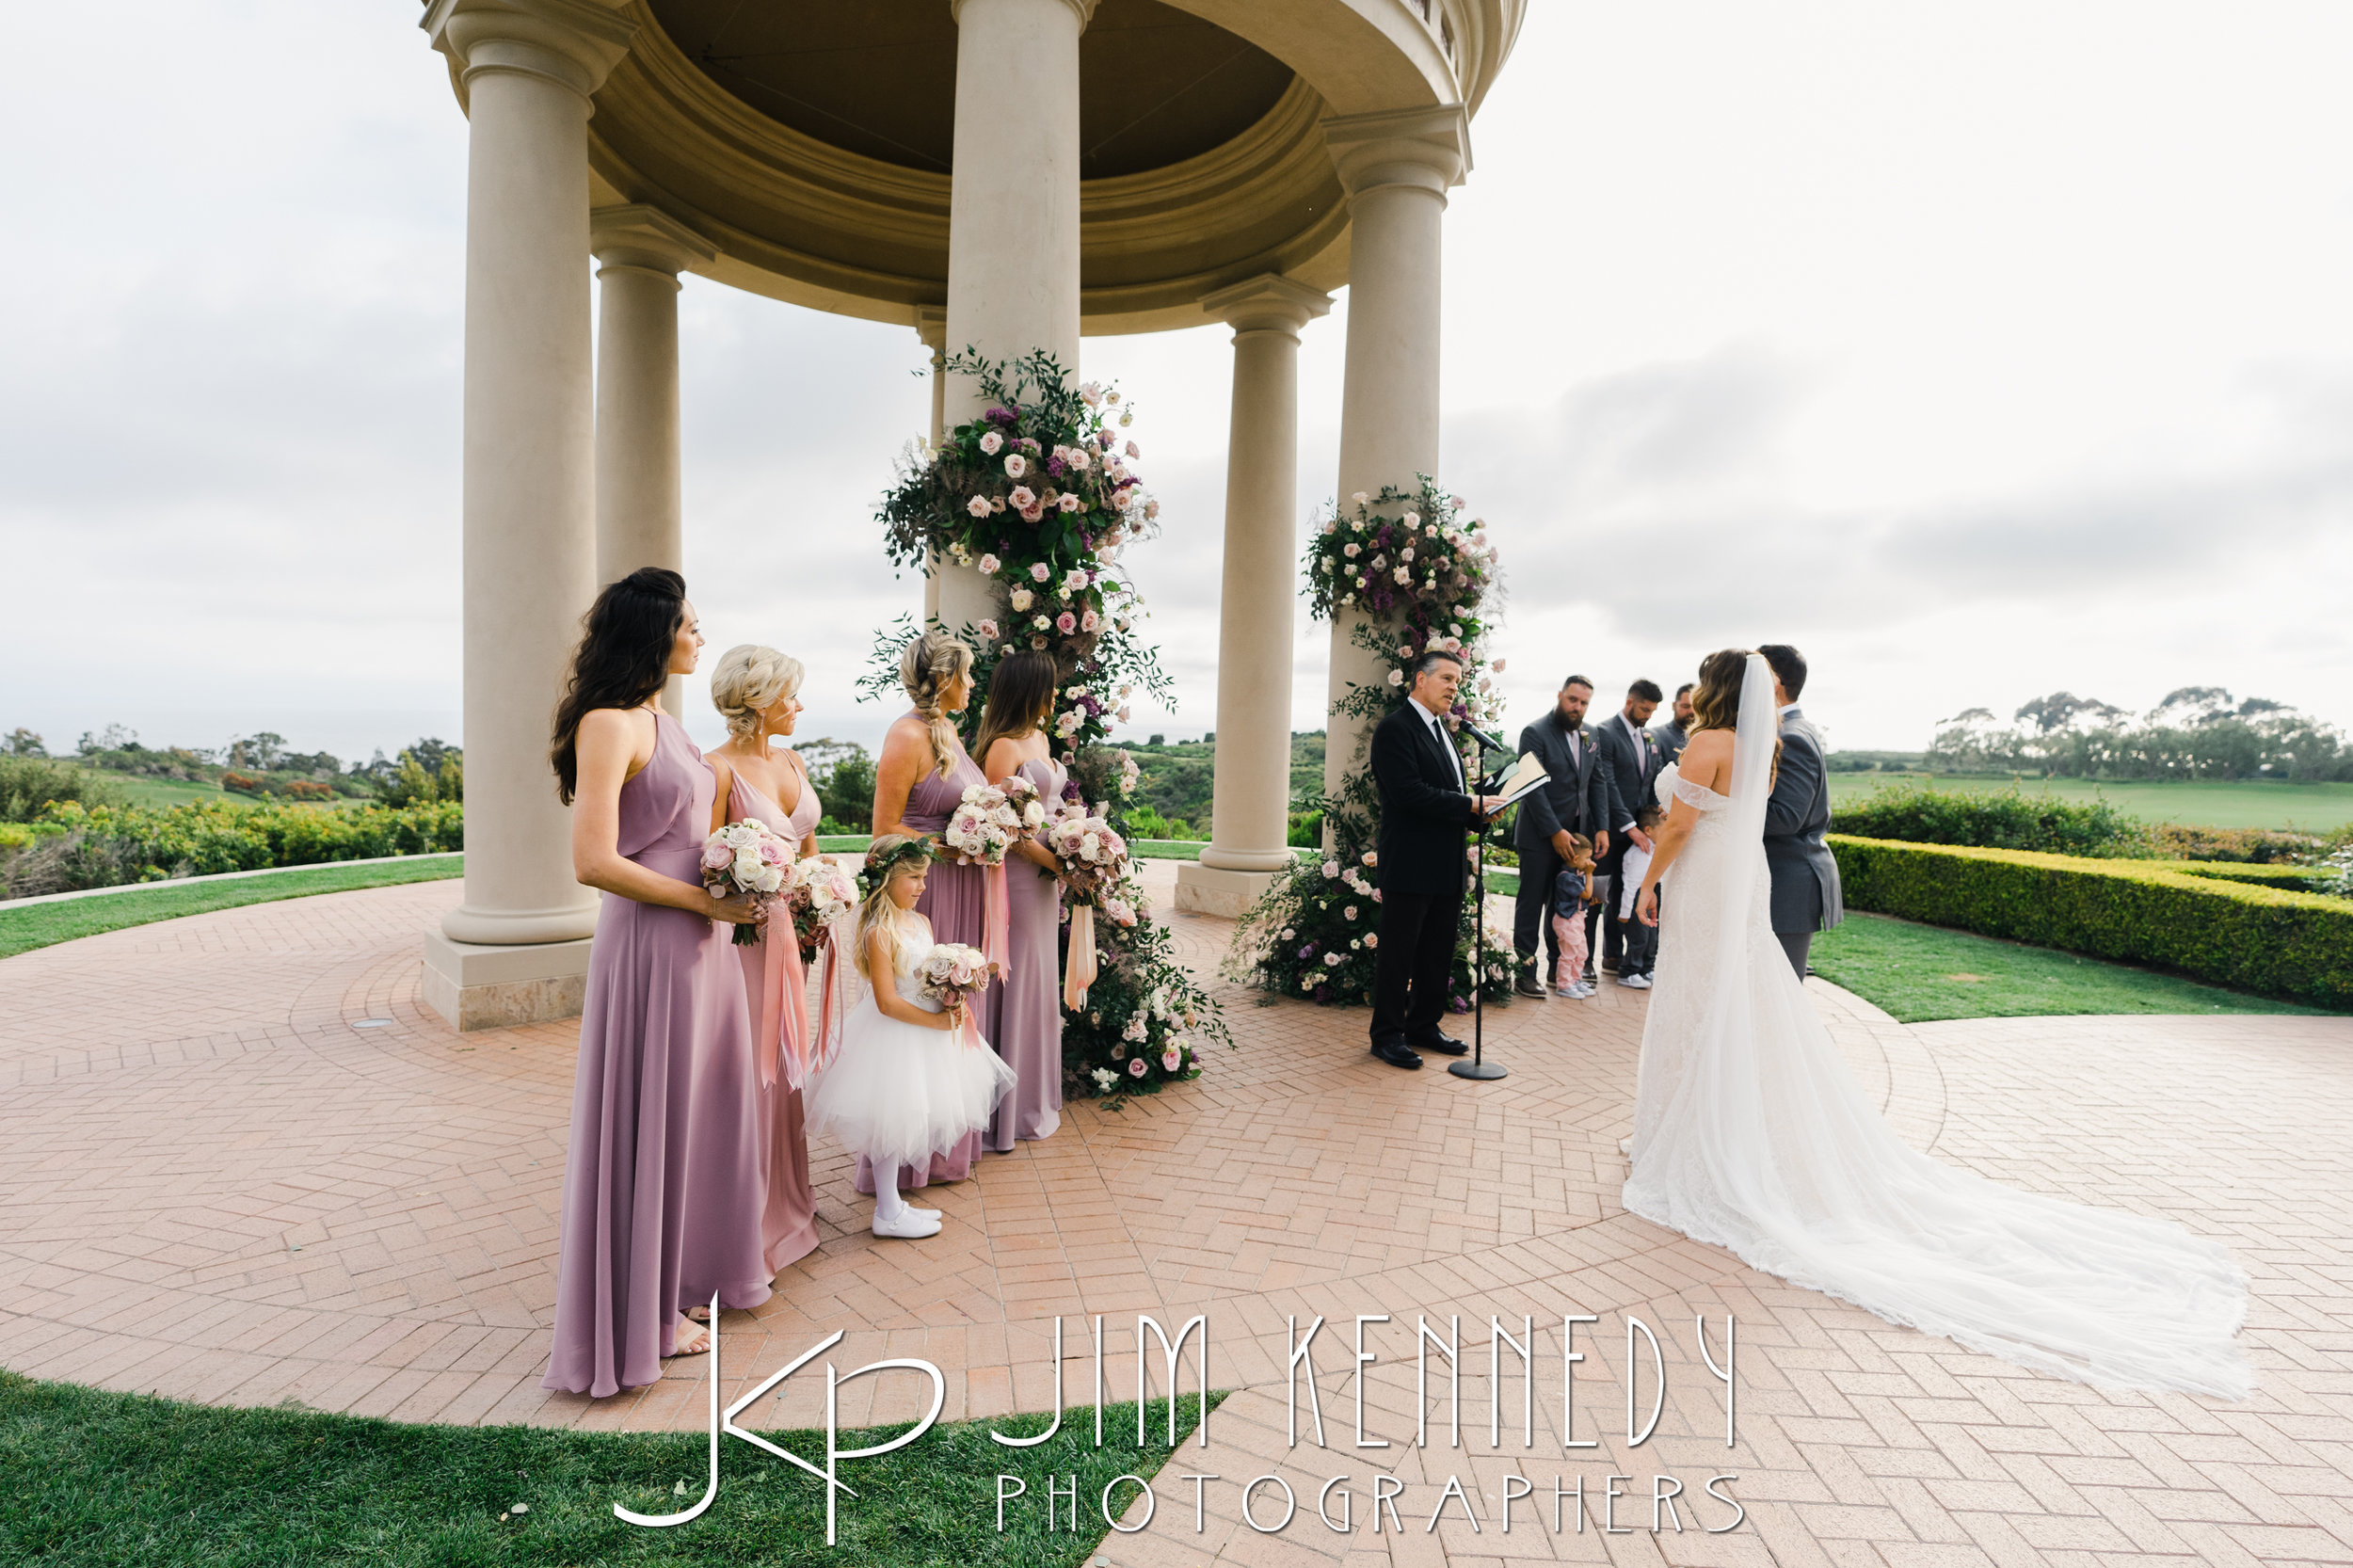 pelican-hill-wedding-jim-kenedy-photographers_0115.JPG